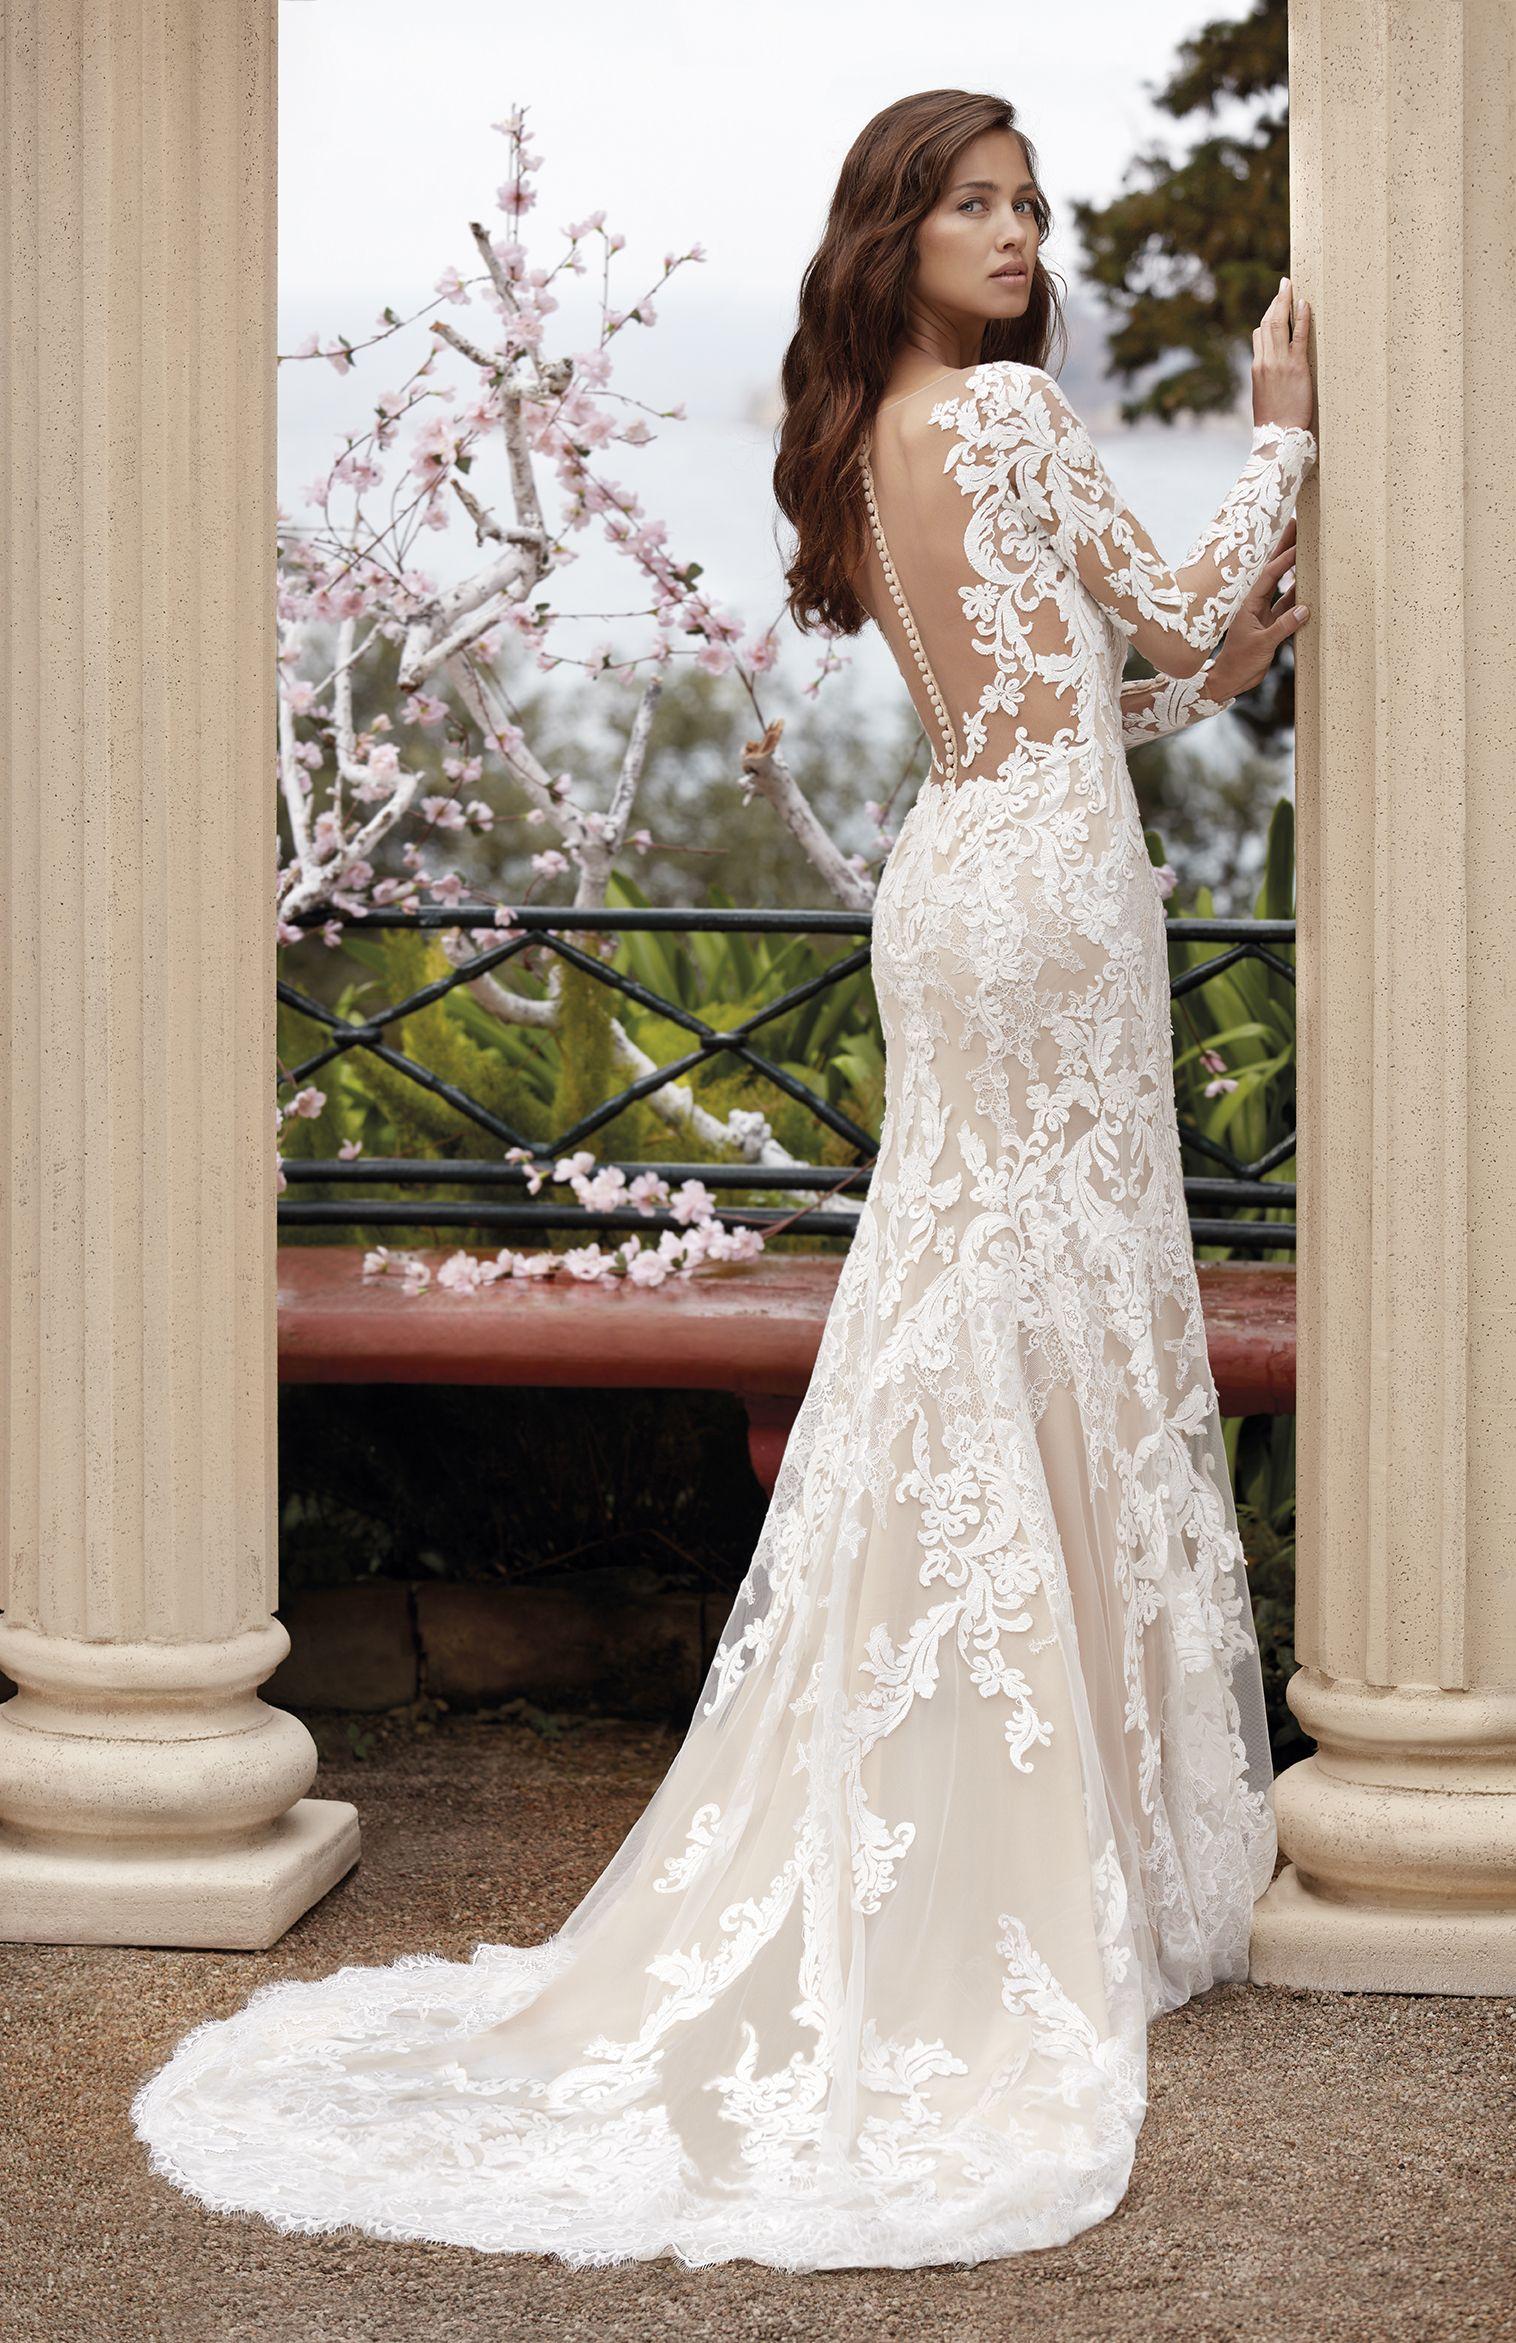 Style 717 #demetriosbride | vestidos de novia | Pinterest | Wedding ...